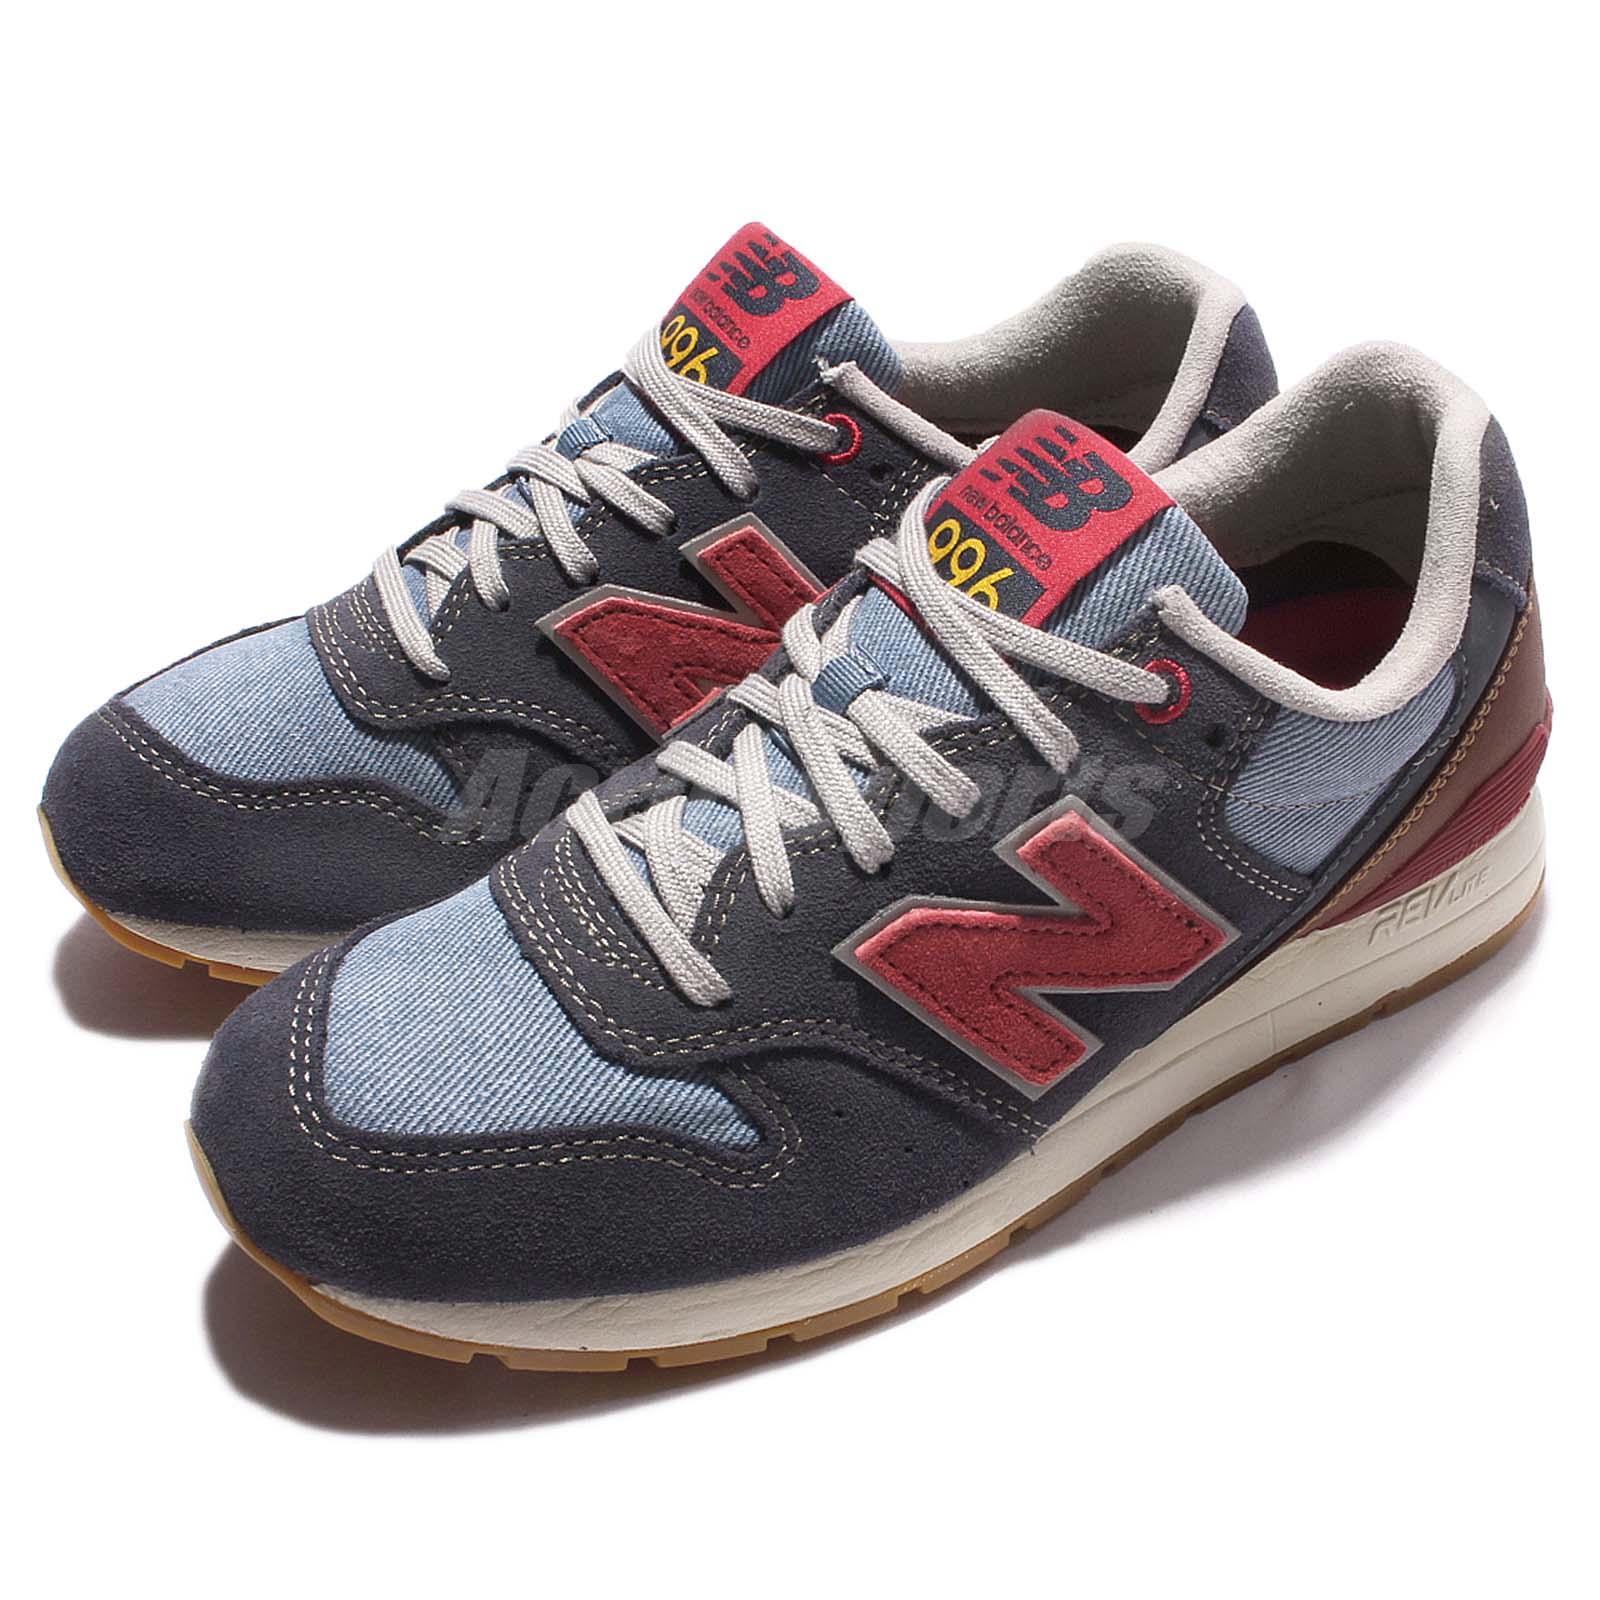 new balance mrl996nf d revlite navy brown red men running shoe sneaker mrl996nfd ebay. Black Bedroom Furniture Sets. Home Design Ideas